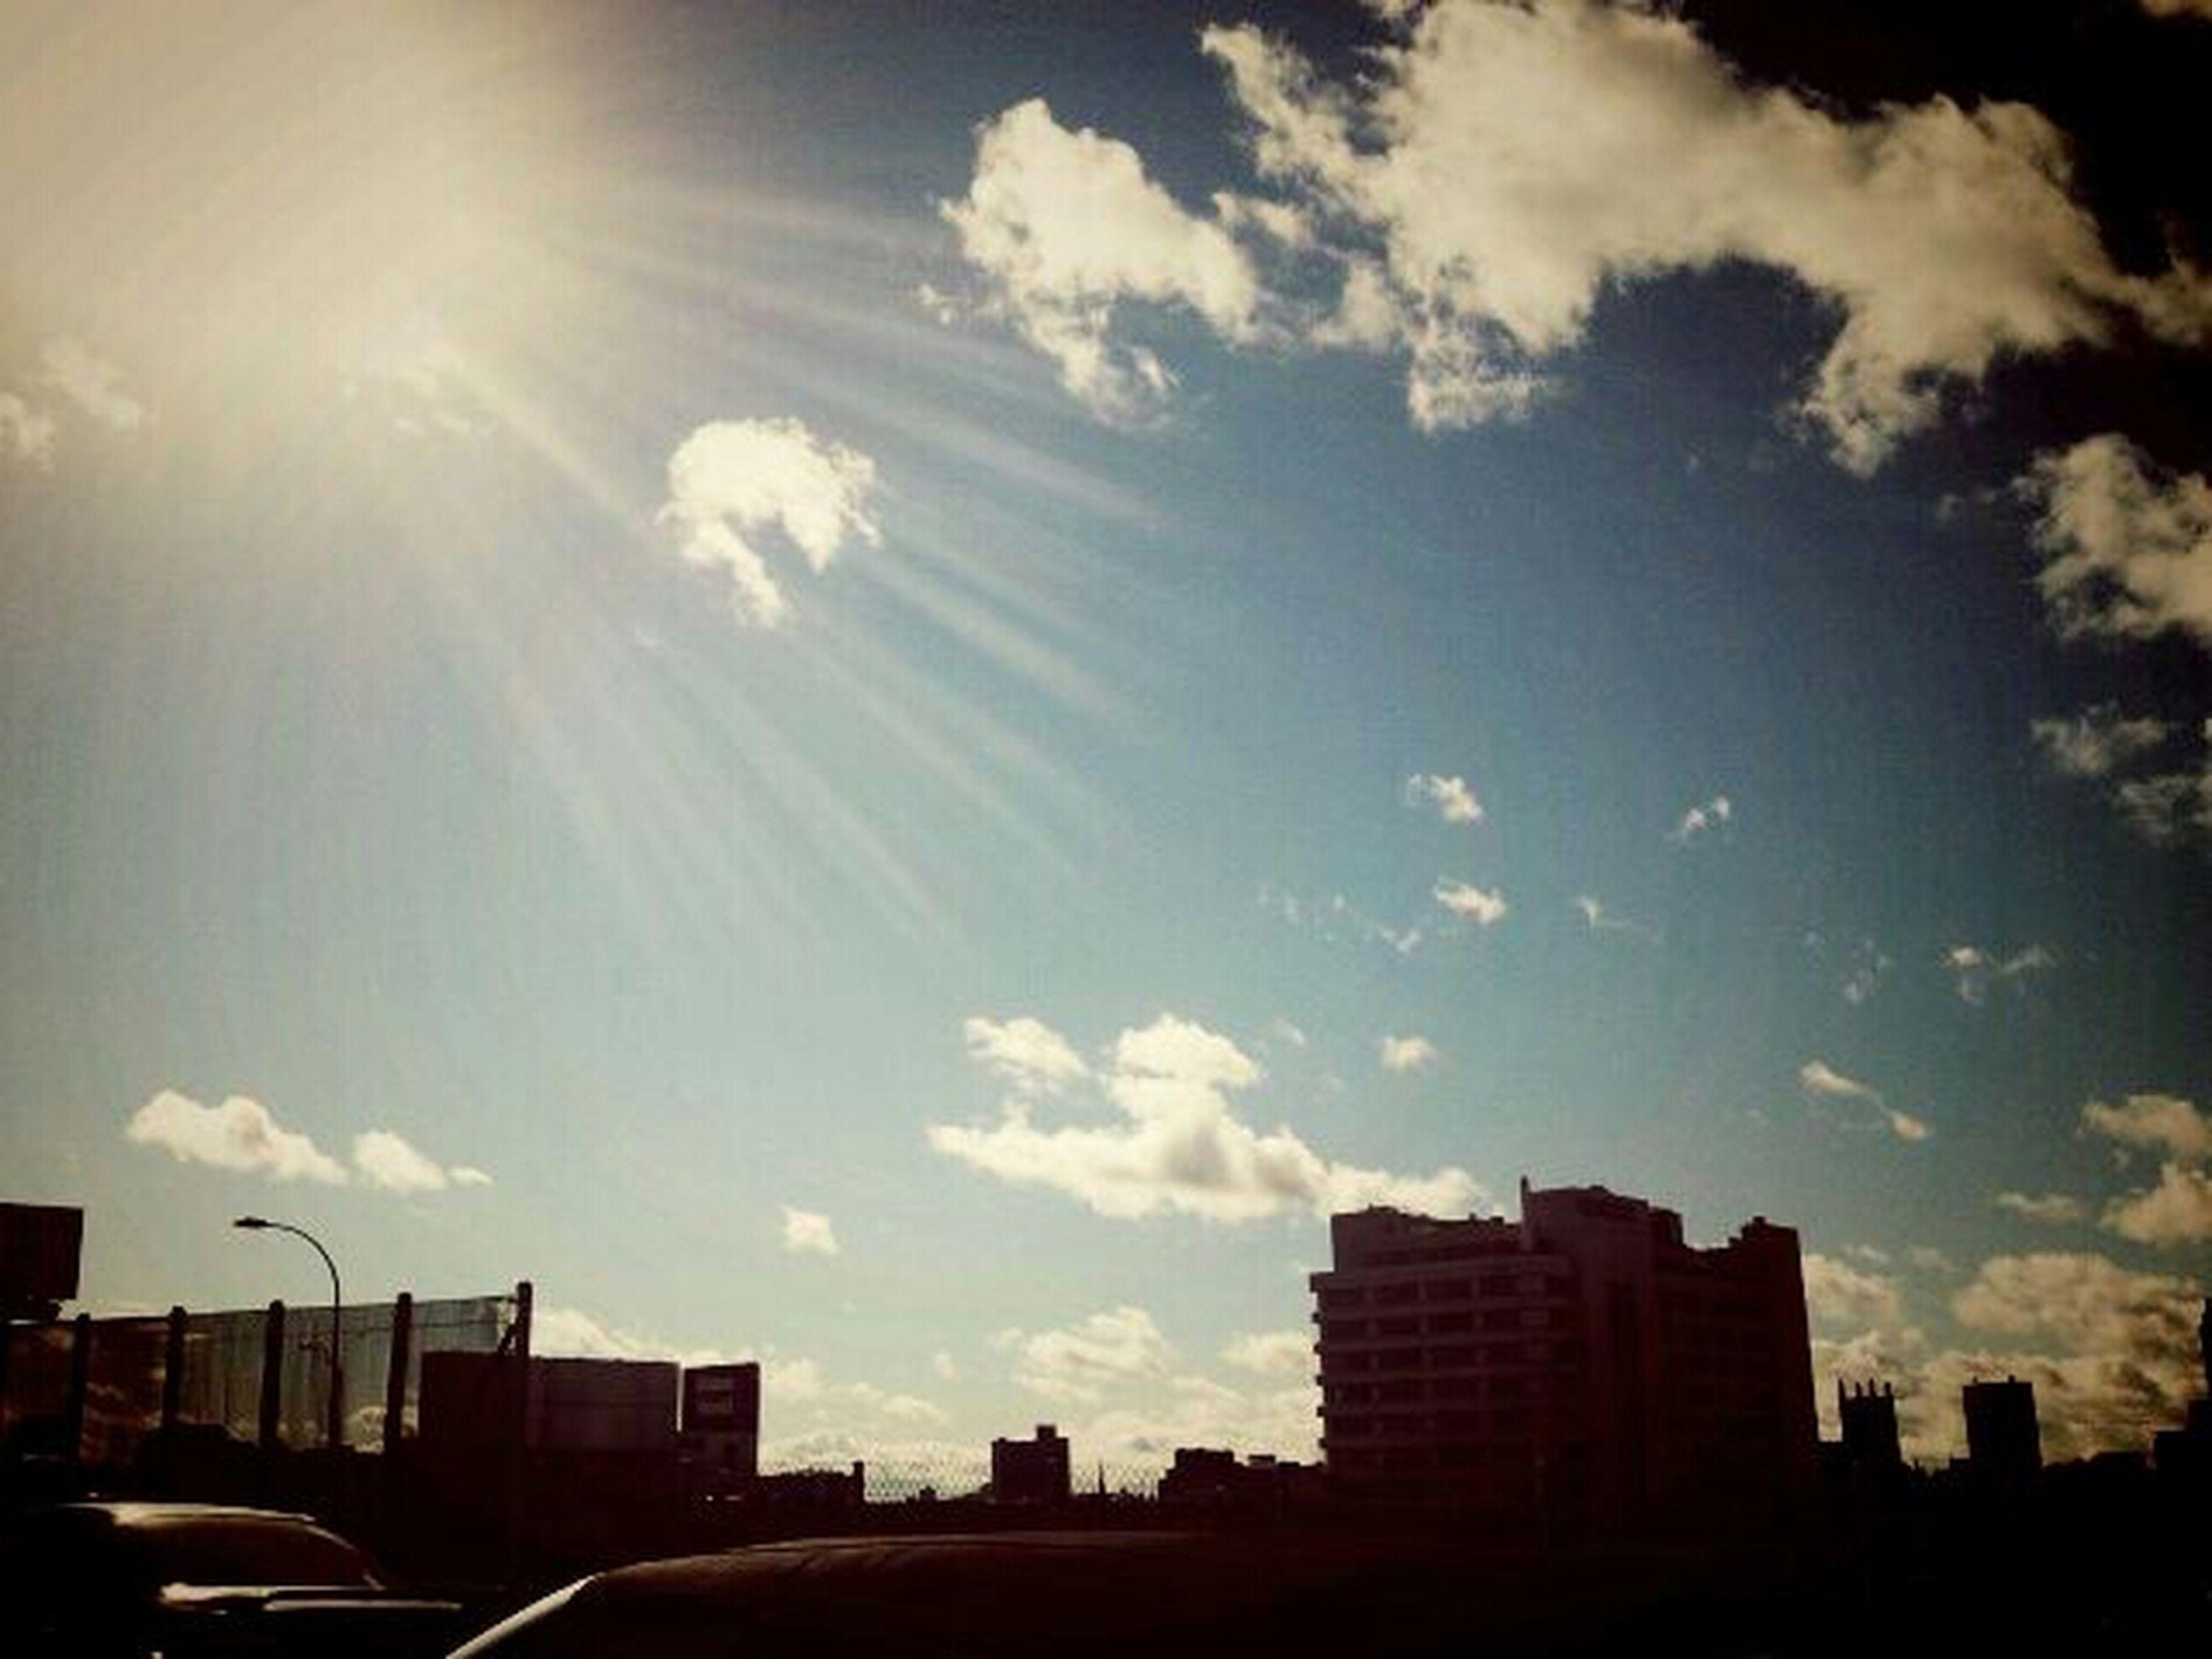 building exterior, architecture, built structure, sky, city, low angle view, sun, sunlight, cloud - sky, building, sunset, silhouette, sunbeam, cloud, transportation, car, outdoors, skyscraper, mode of transport, city life